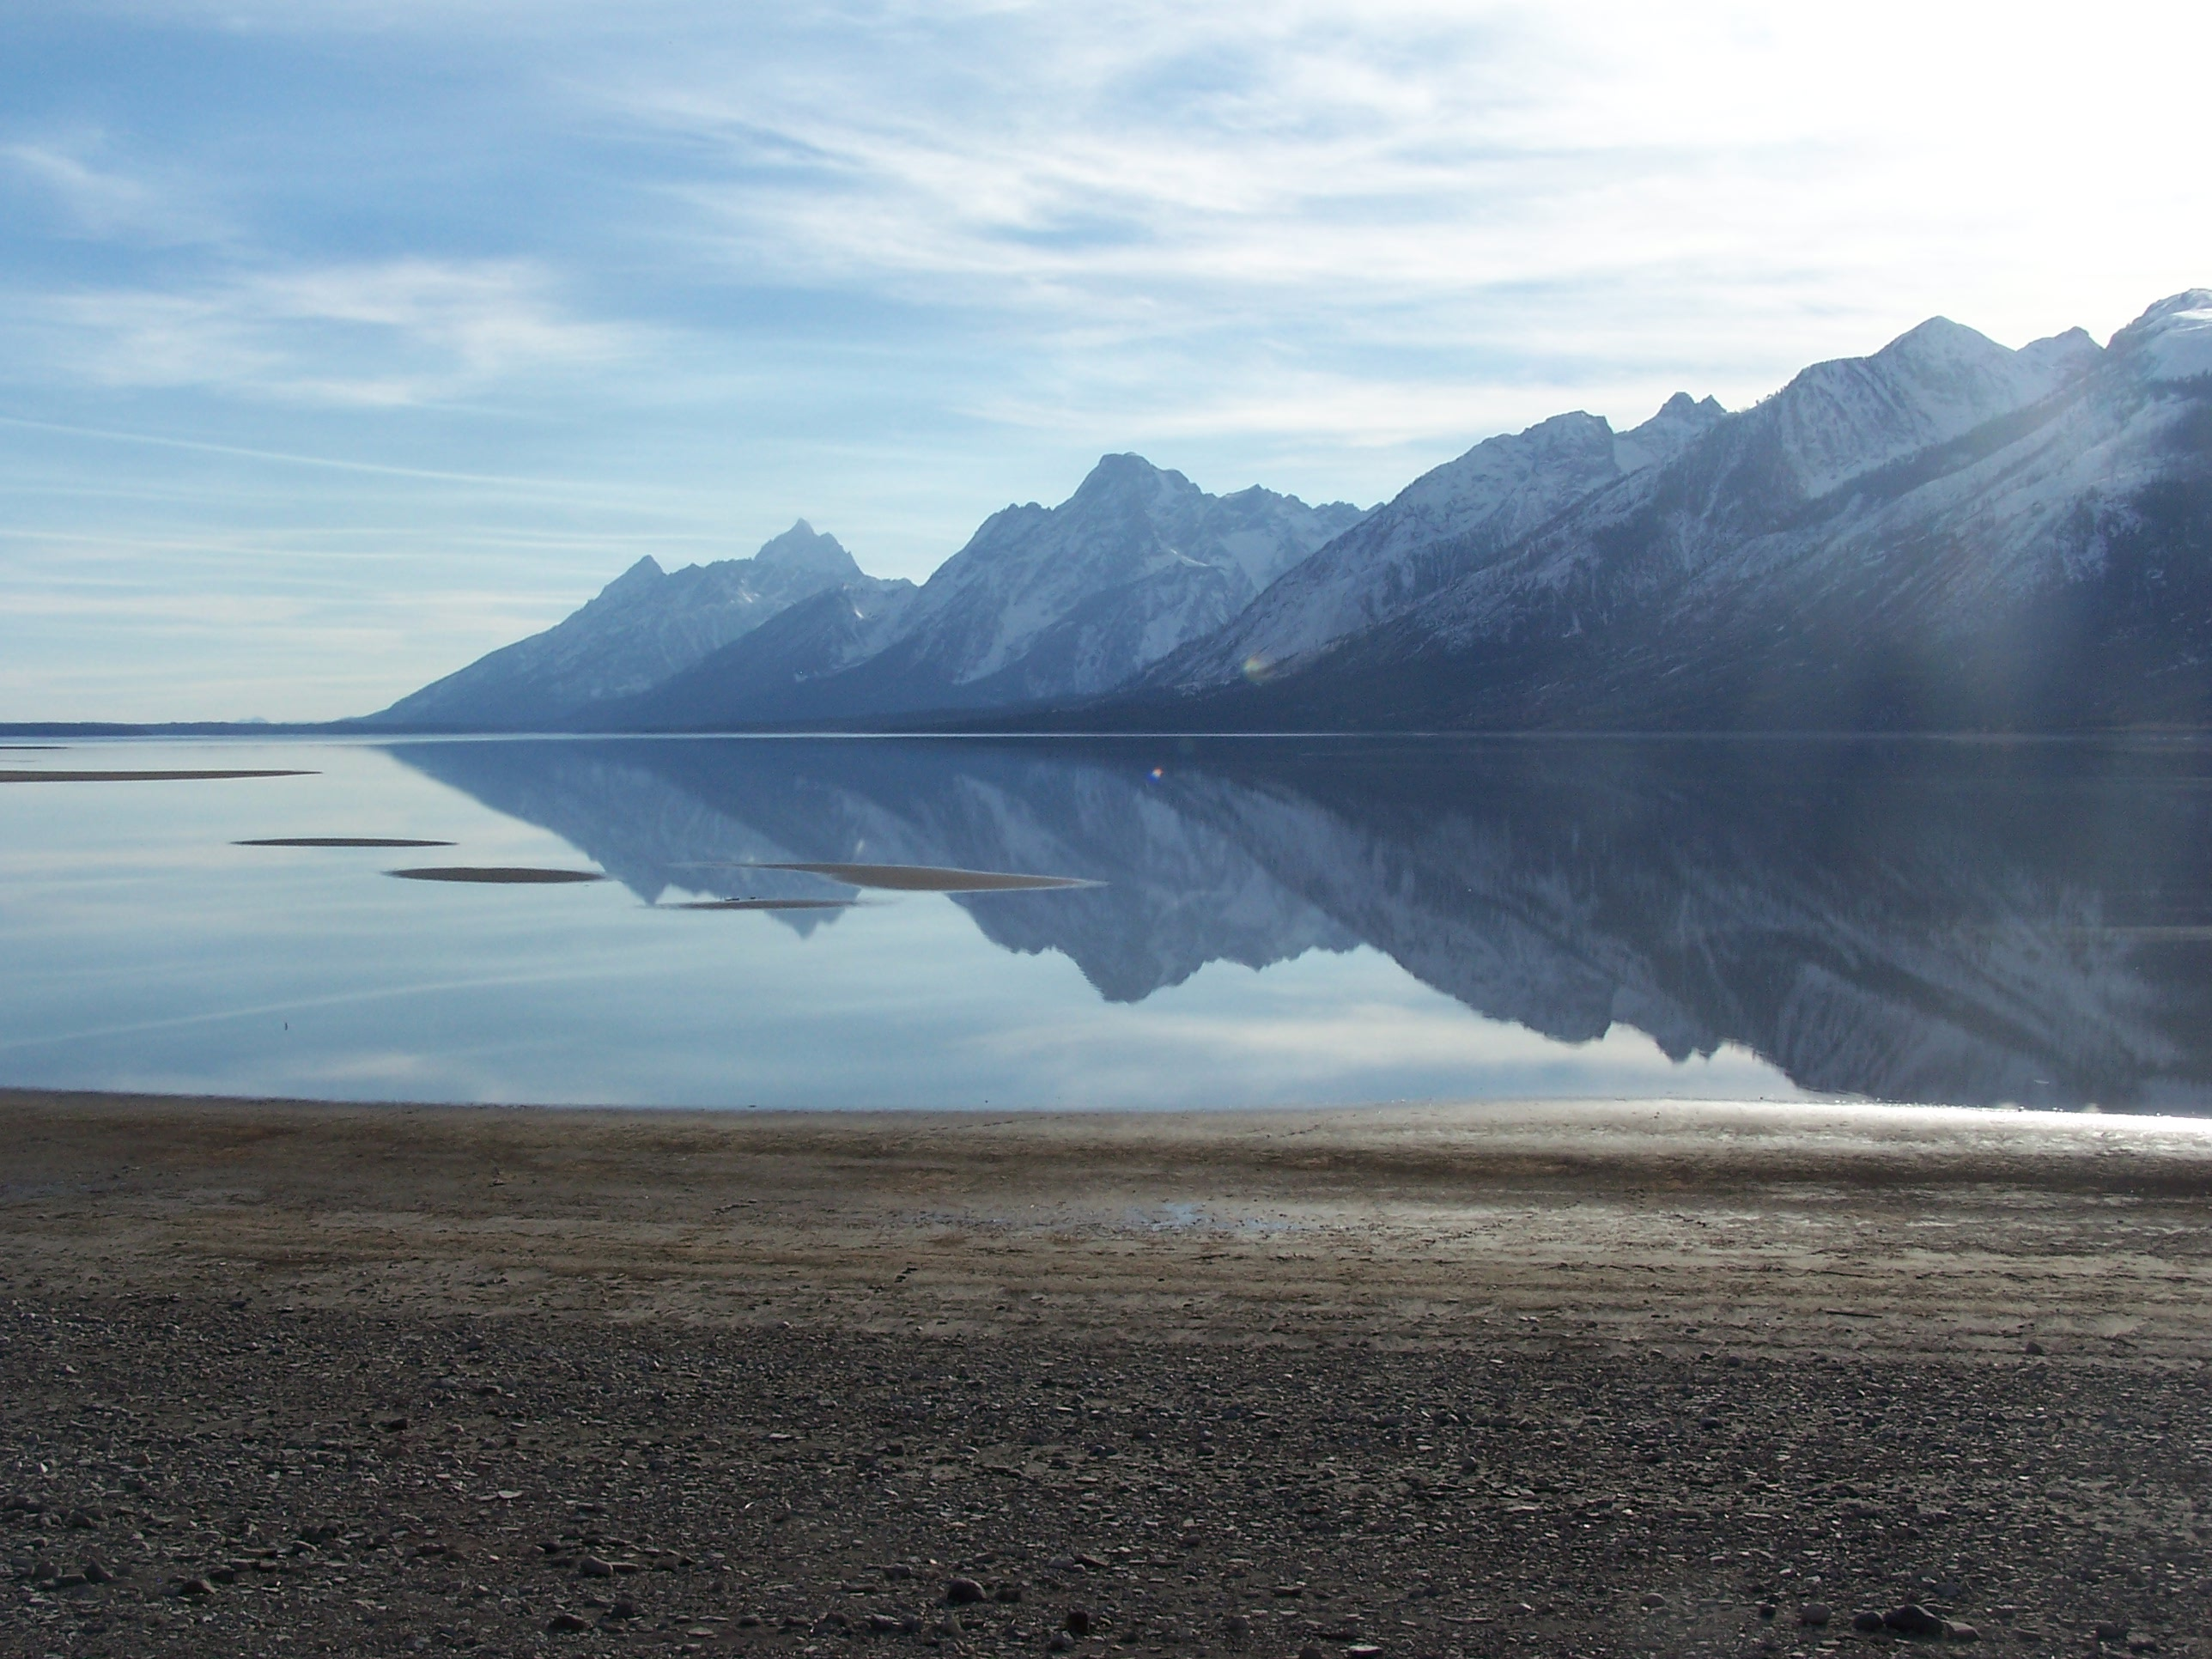 Arrowheads on Jackson Lake